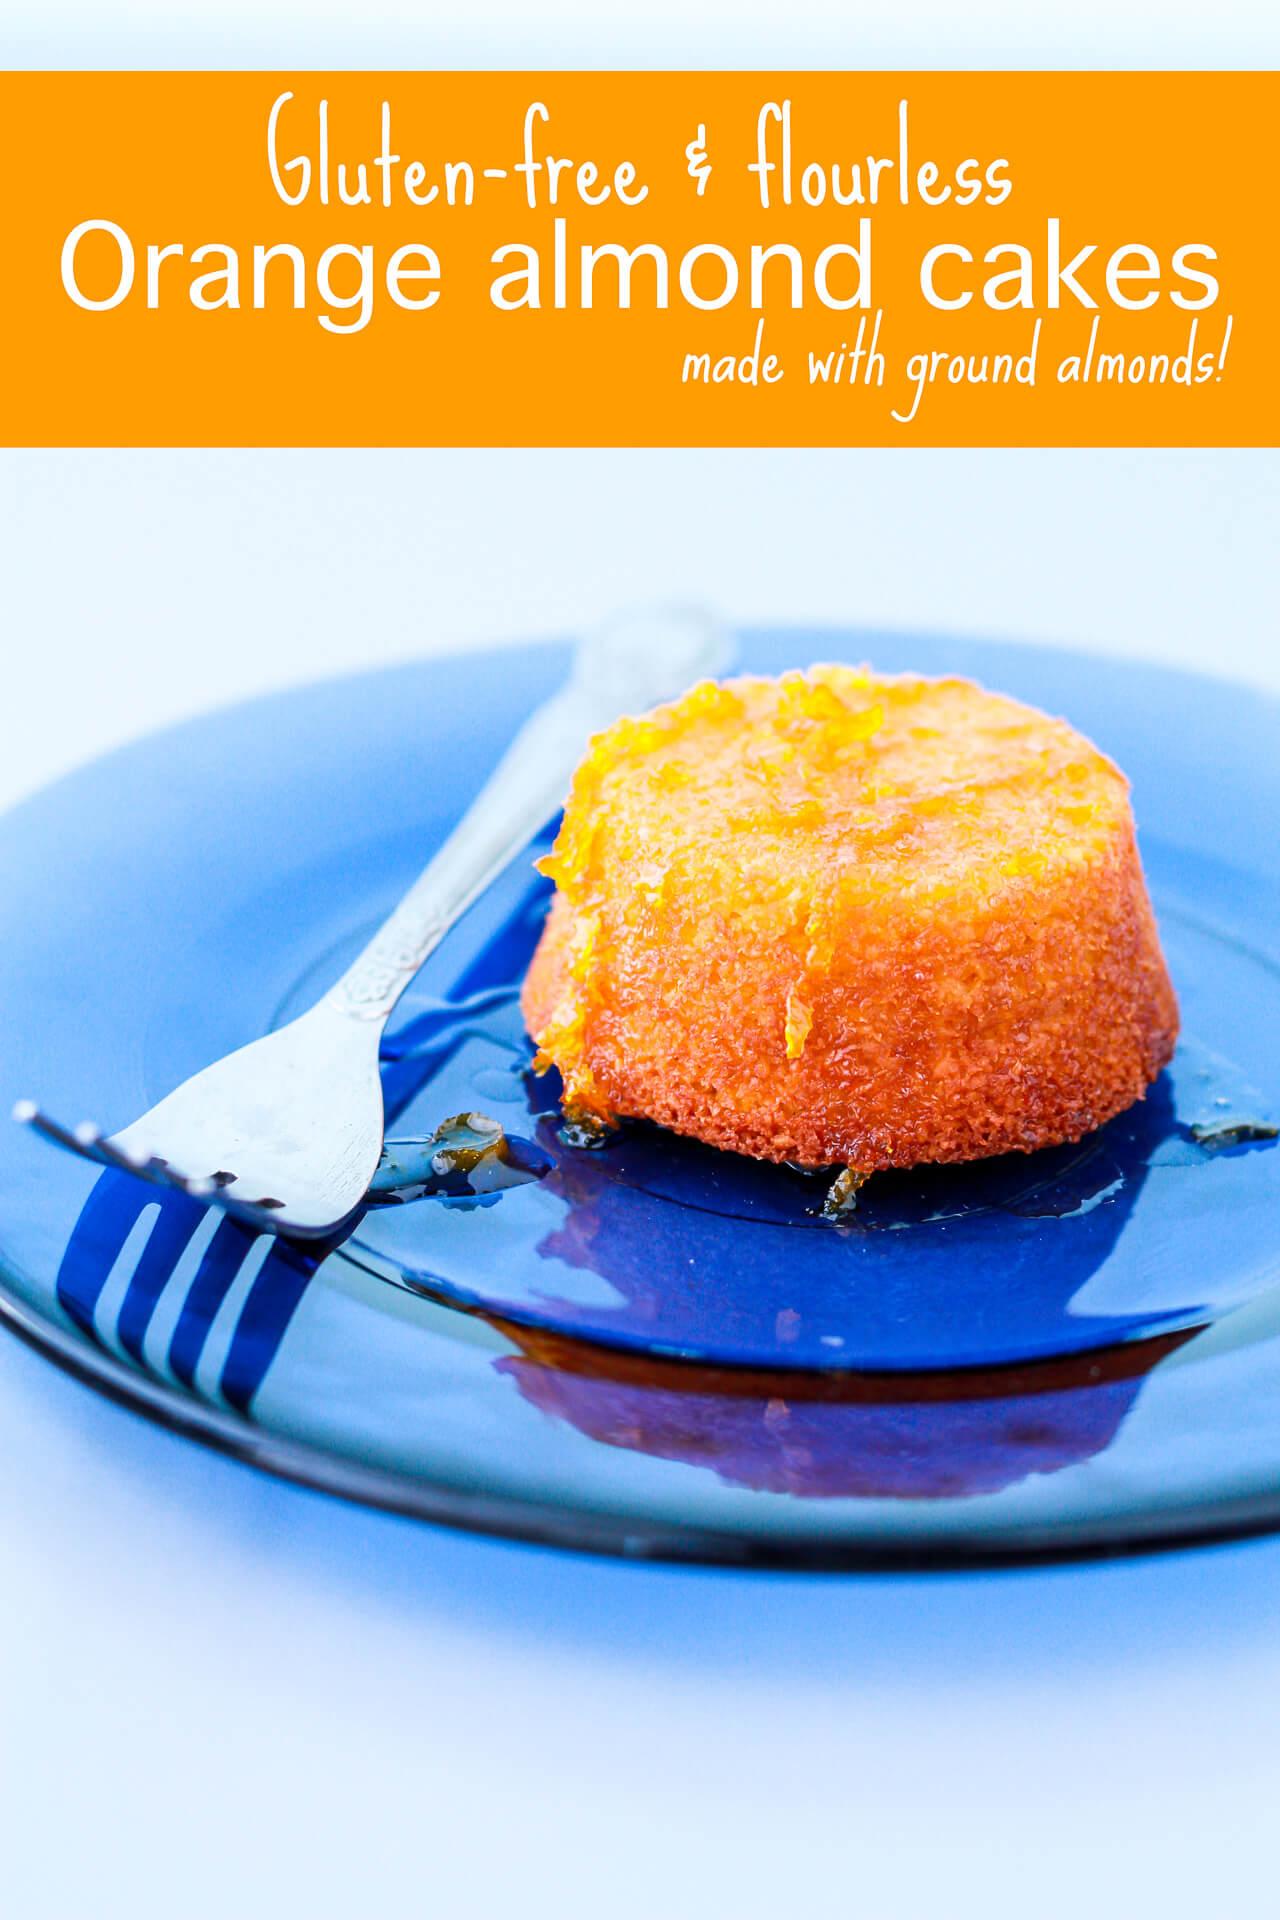 Little orange cake with orange zest syrup served on a blue plate with a fork, backlit food photo